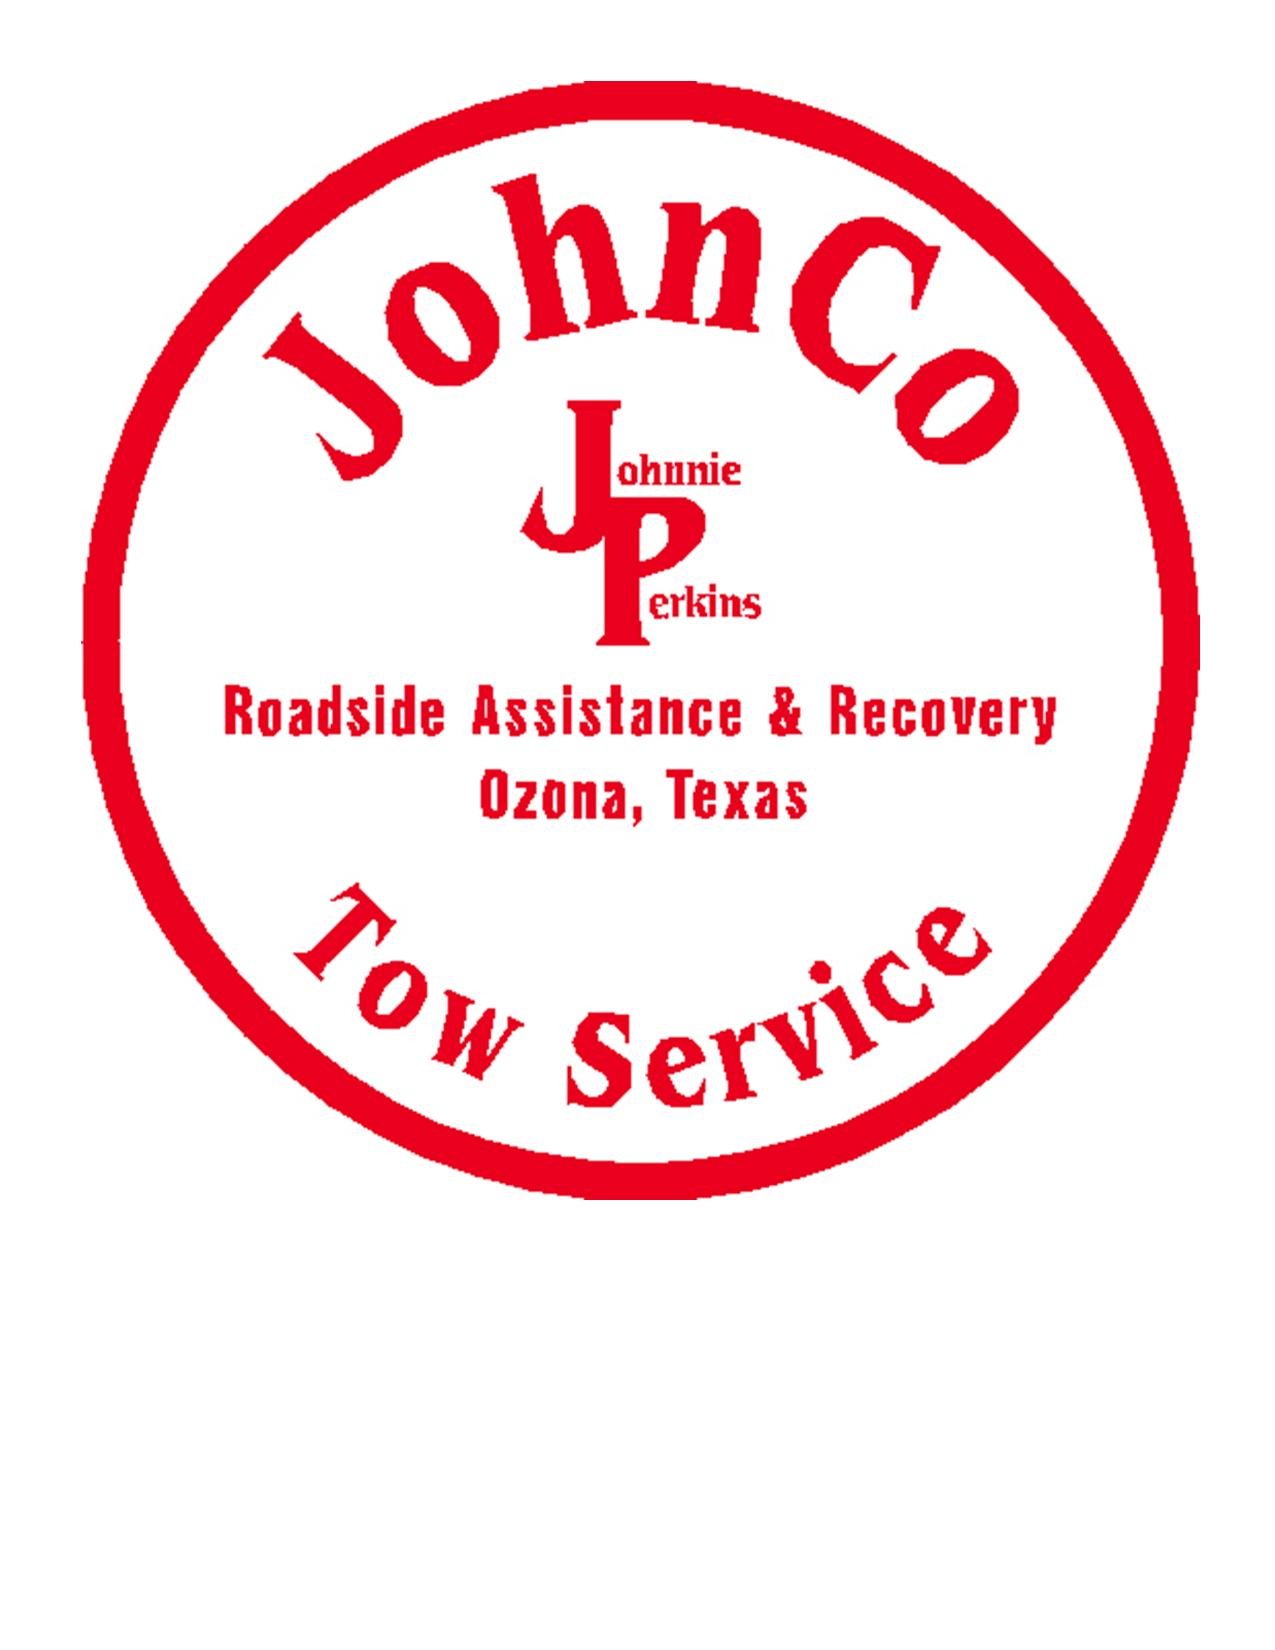 JohnCo Wrecker Service